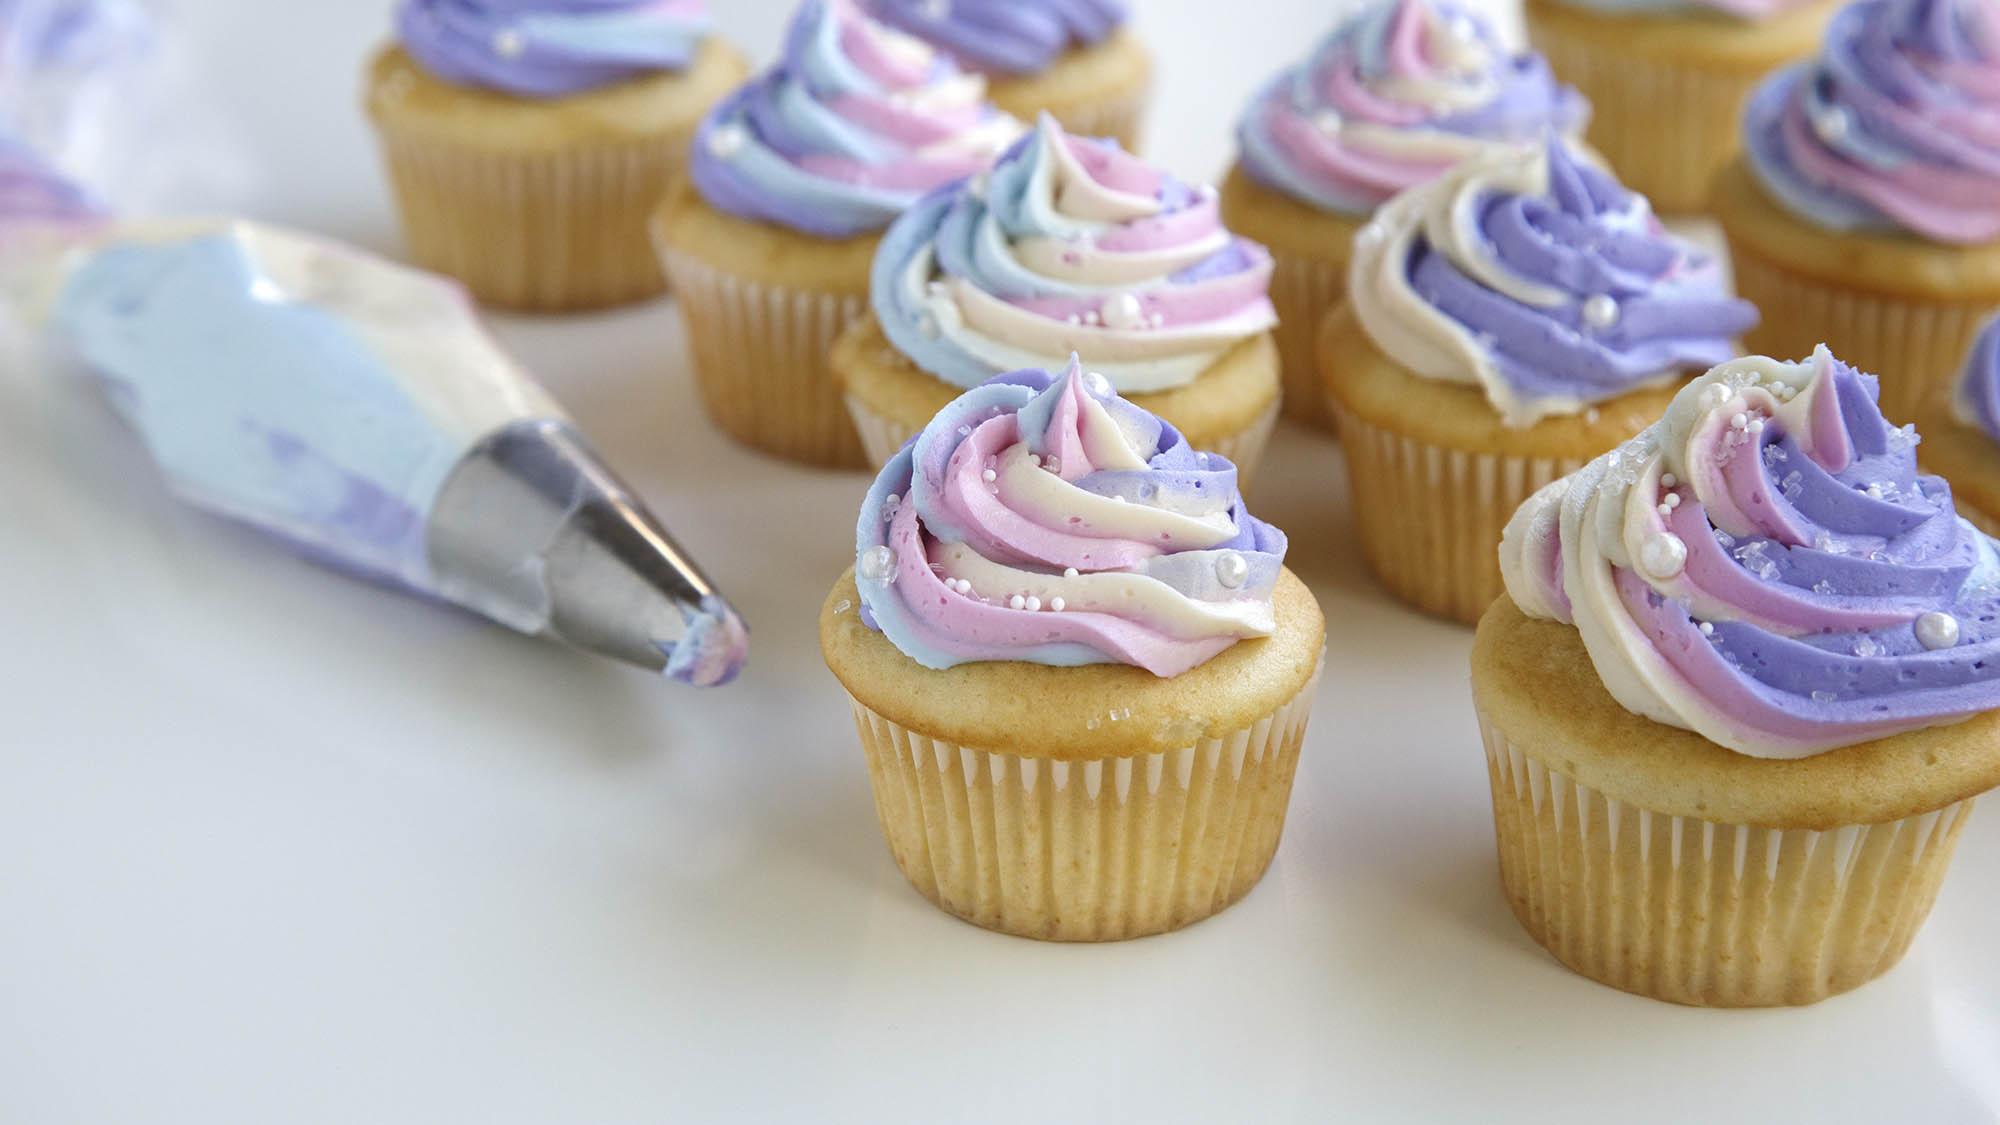 Unicorn_Cupcakes_2000x1125.jpg